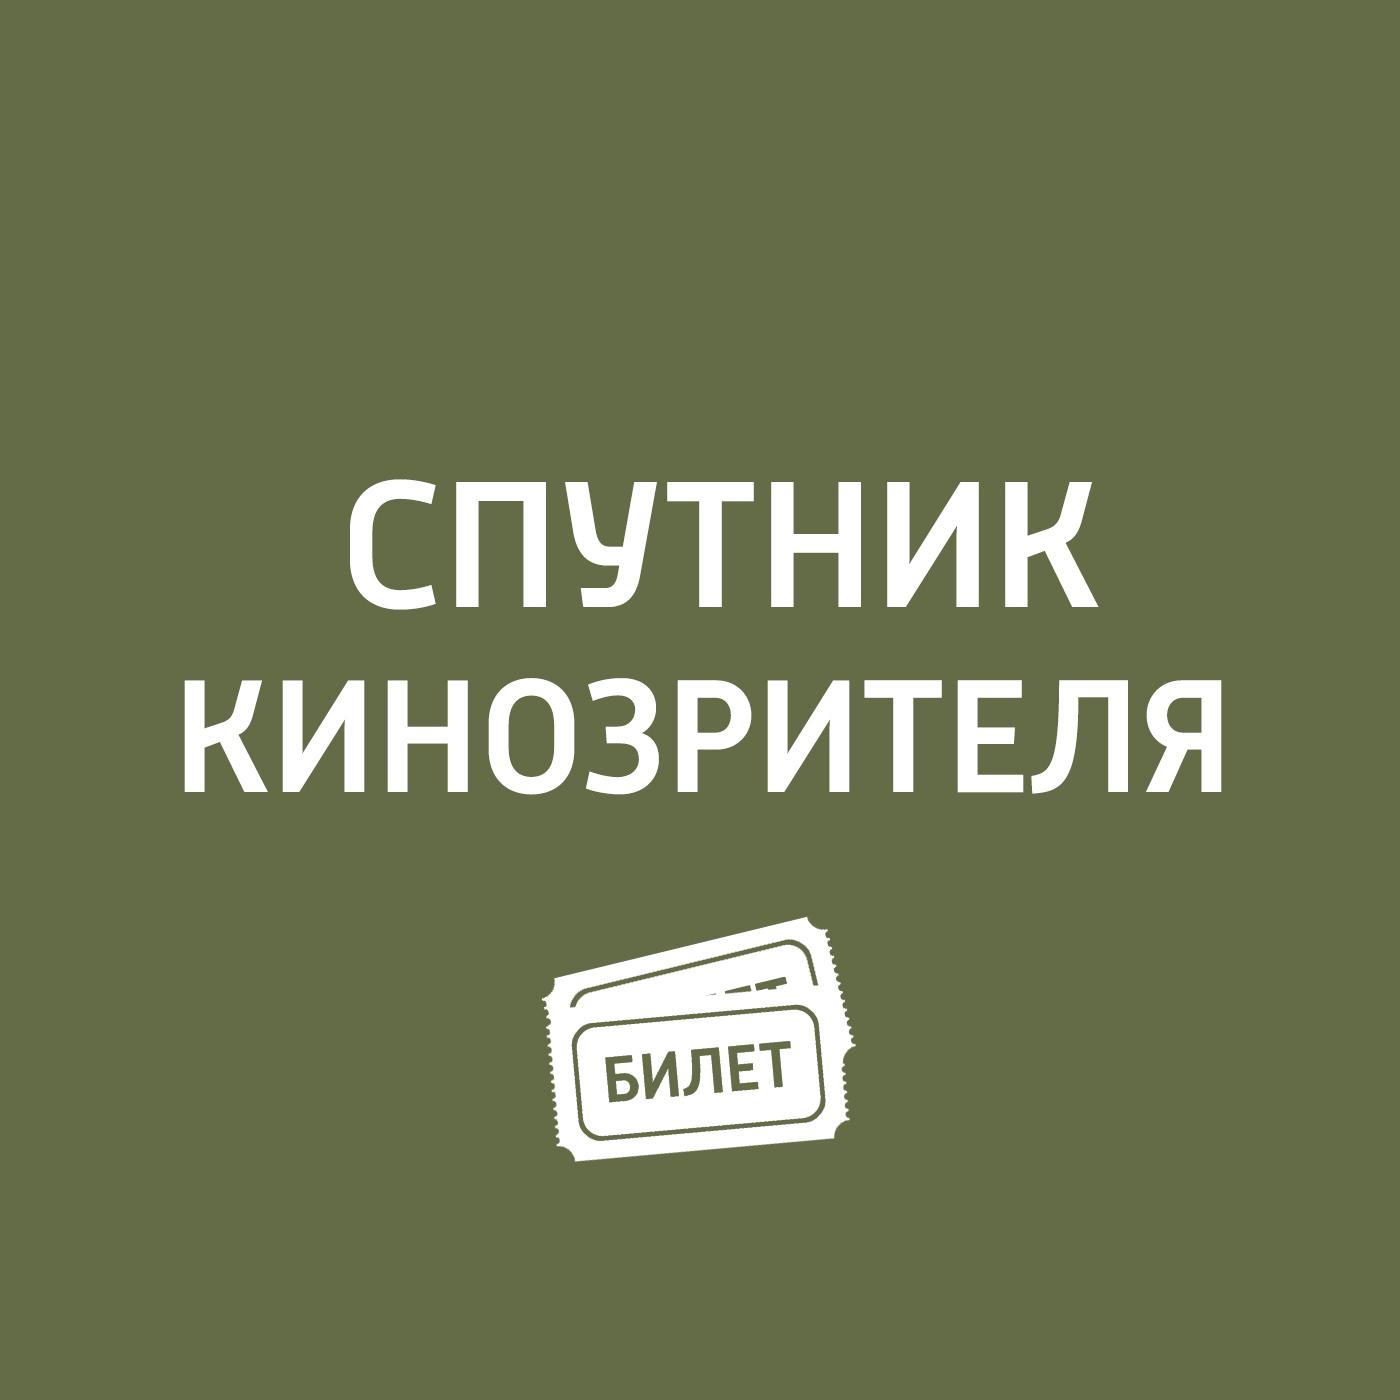 Антон Долин 39-й ММКФ антон долин 39 й ммкф